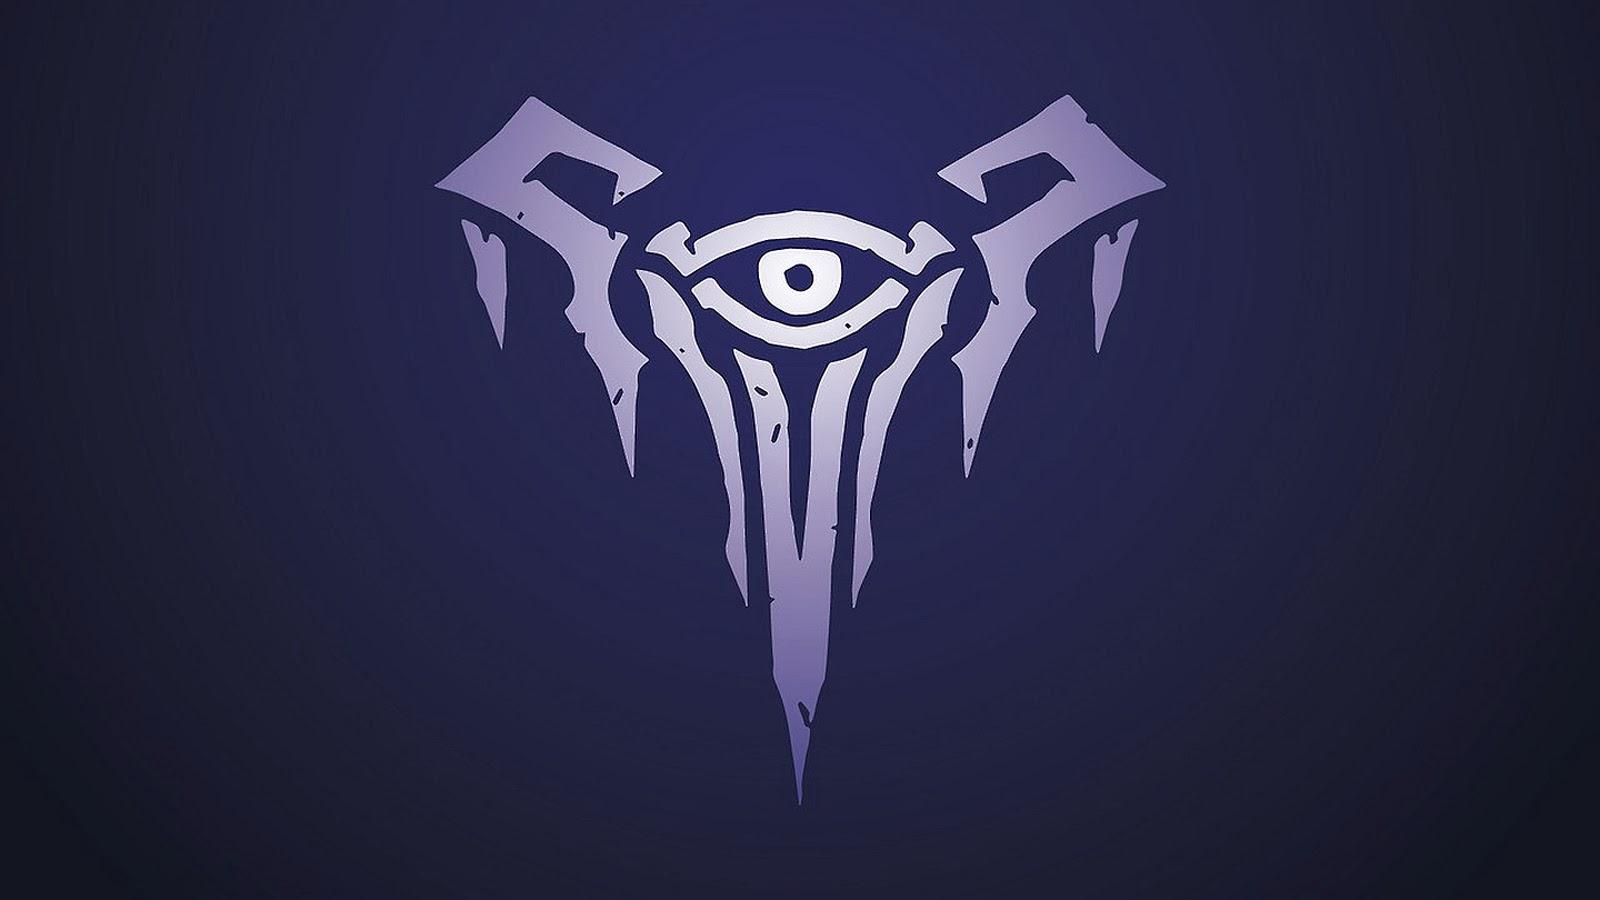 league of legends player avatar icon logo hd wallpaper 1600x900 3d 1600x900